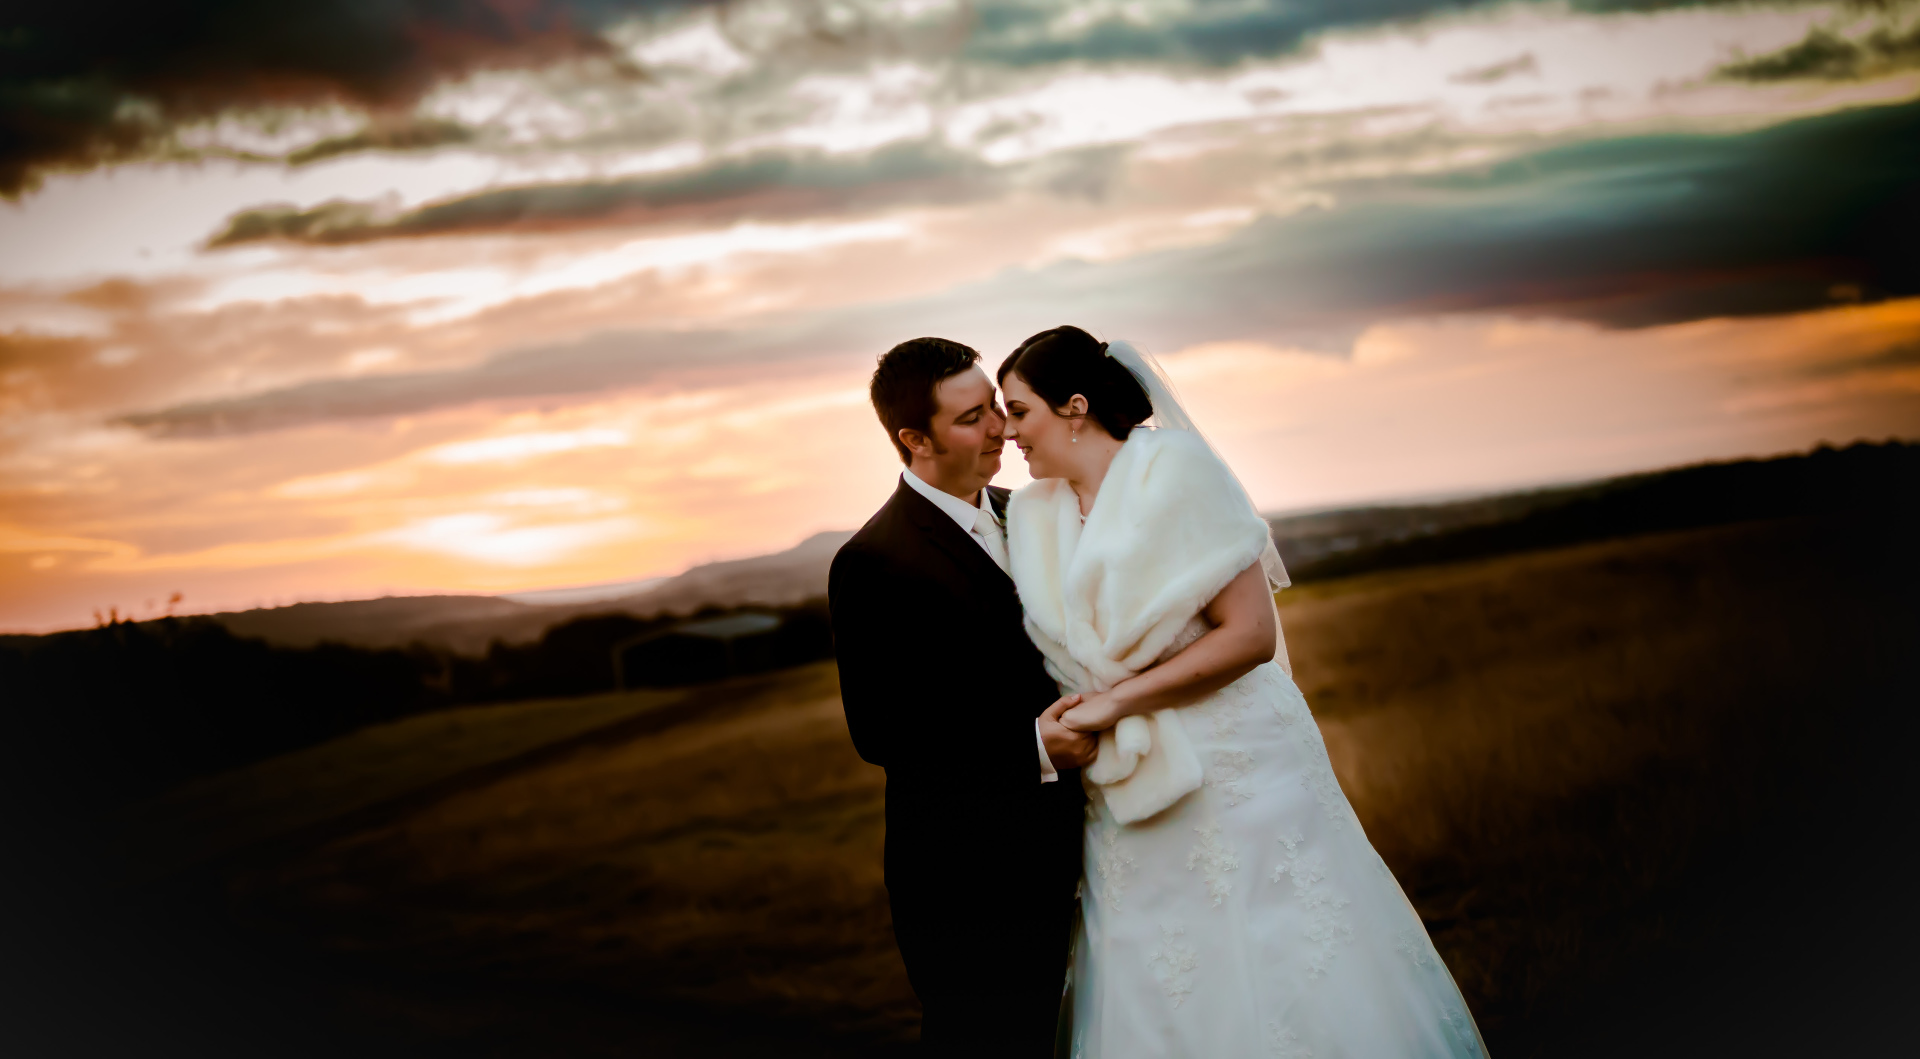 Anton & Sarah   Toowoomba Surrounds   Toowoomba Wedding Photography